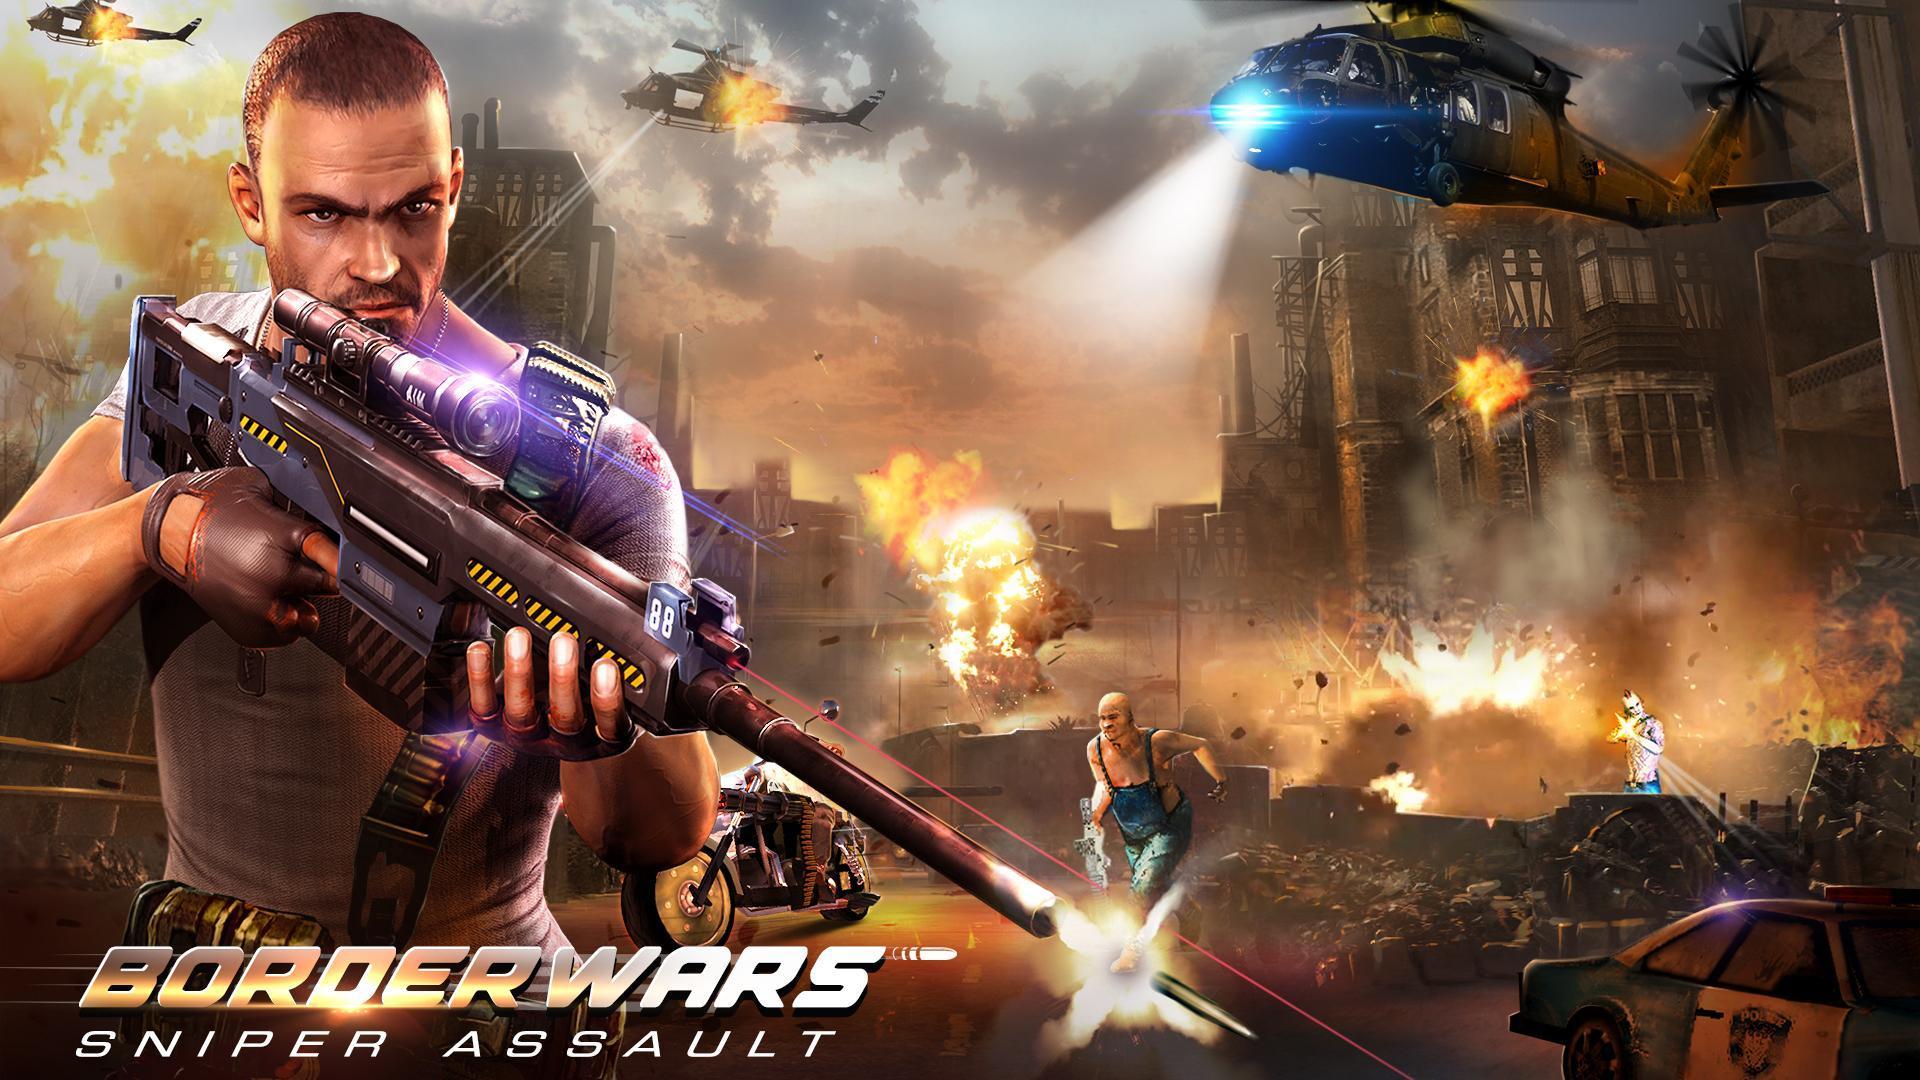 Border Wars: Sniper Assault for Android - APK Download